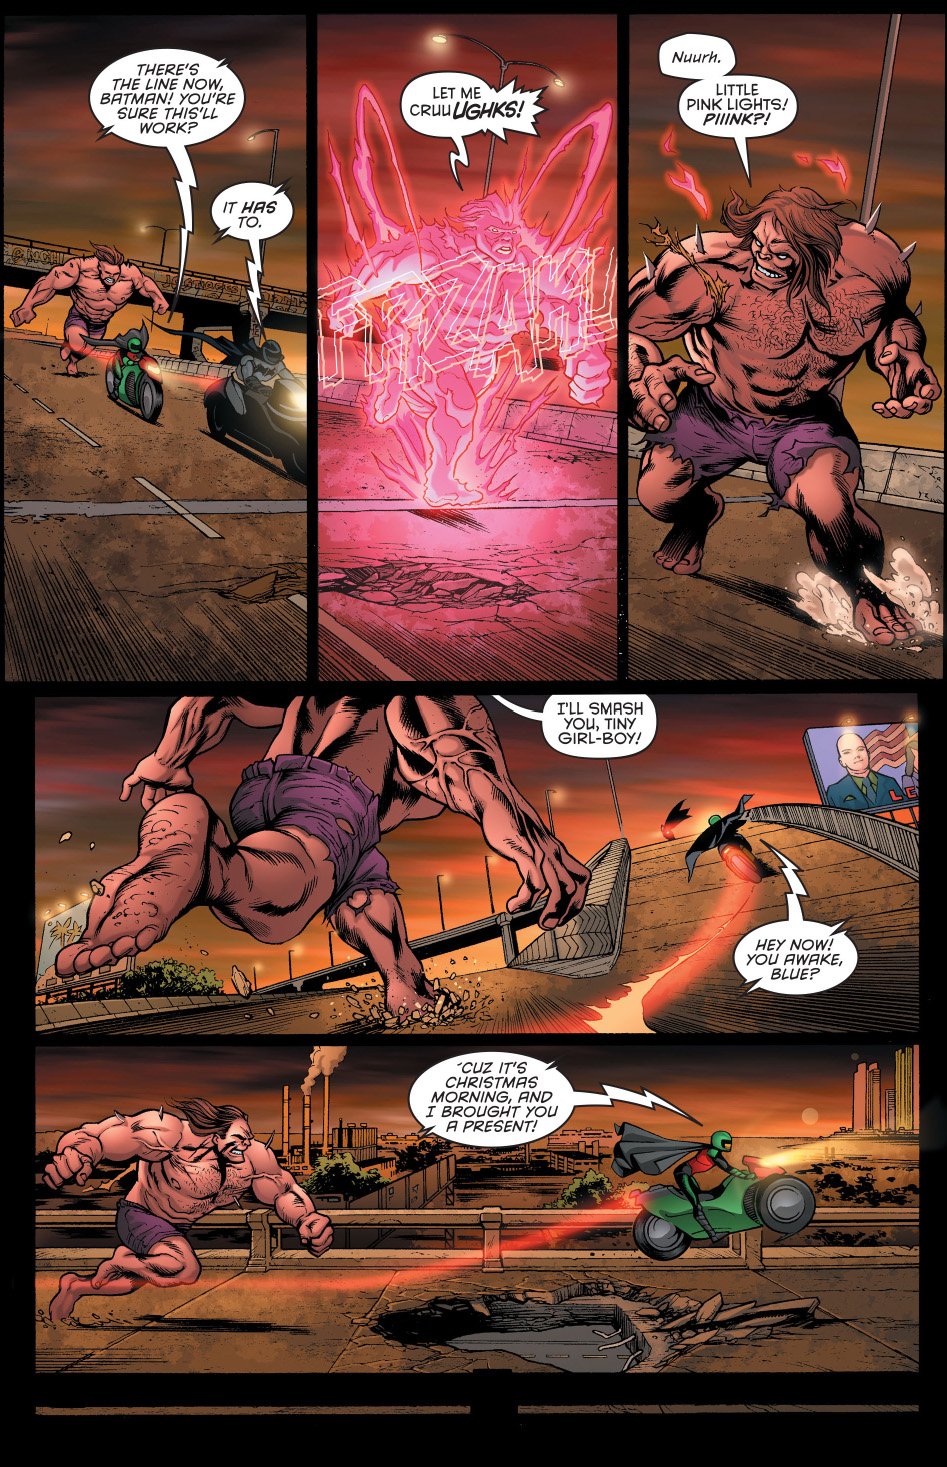 Batman And Robin Sets A Trap For Blockbuster  Comicnewbies-8755